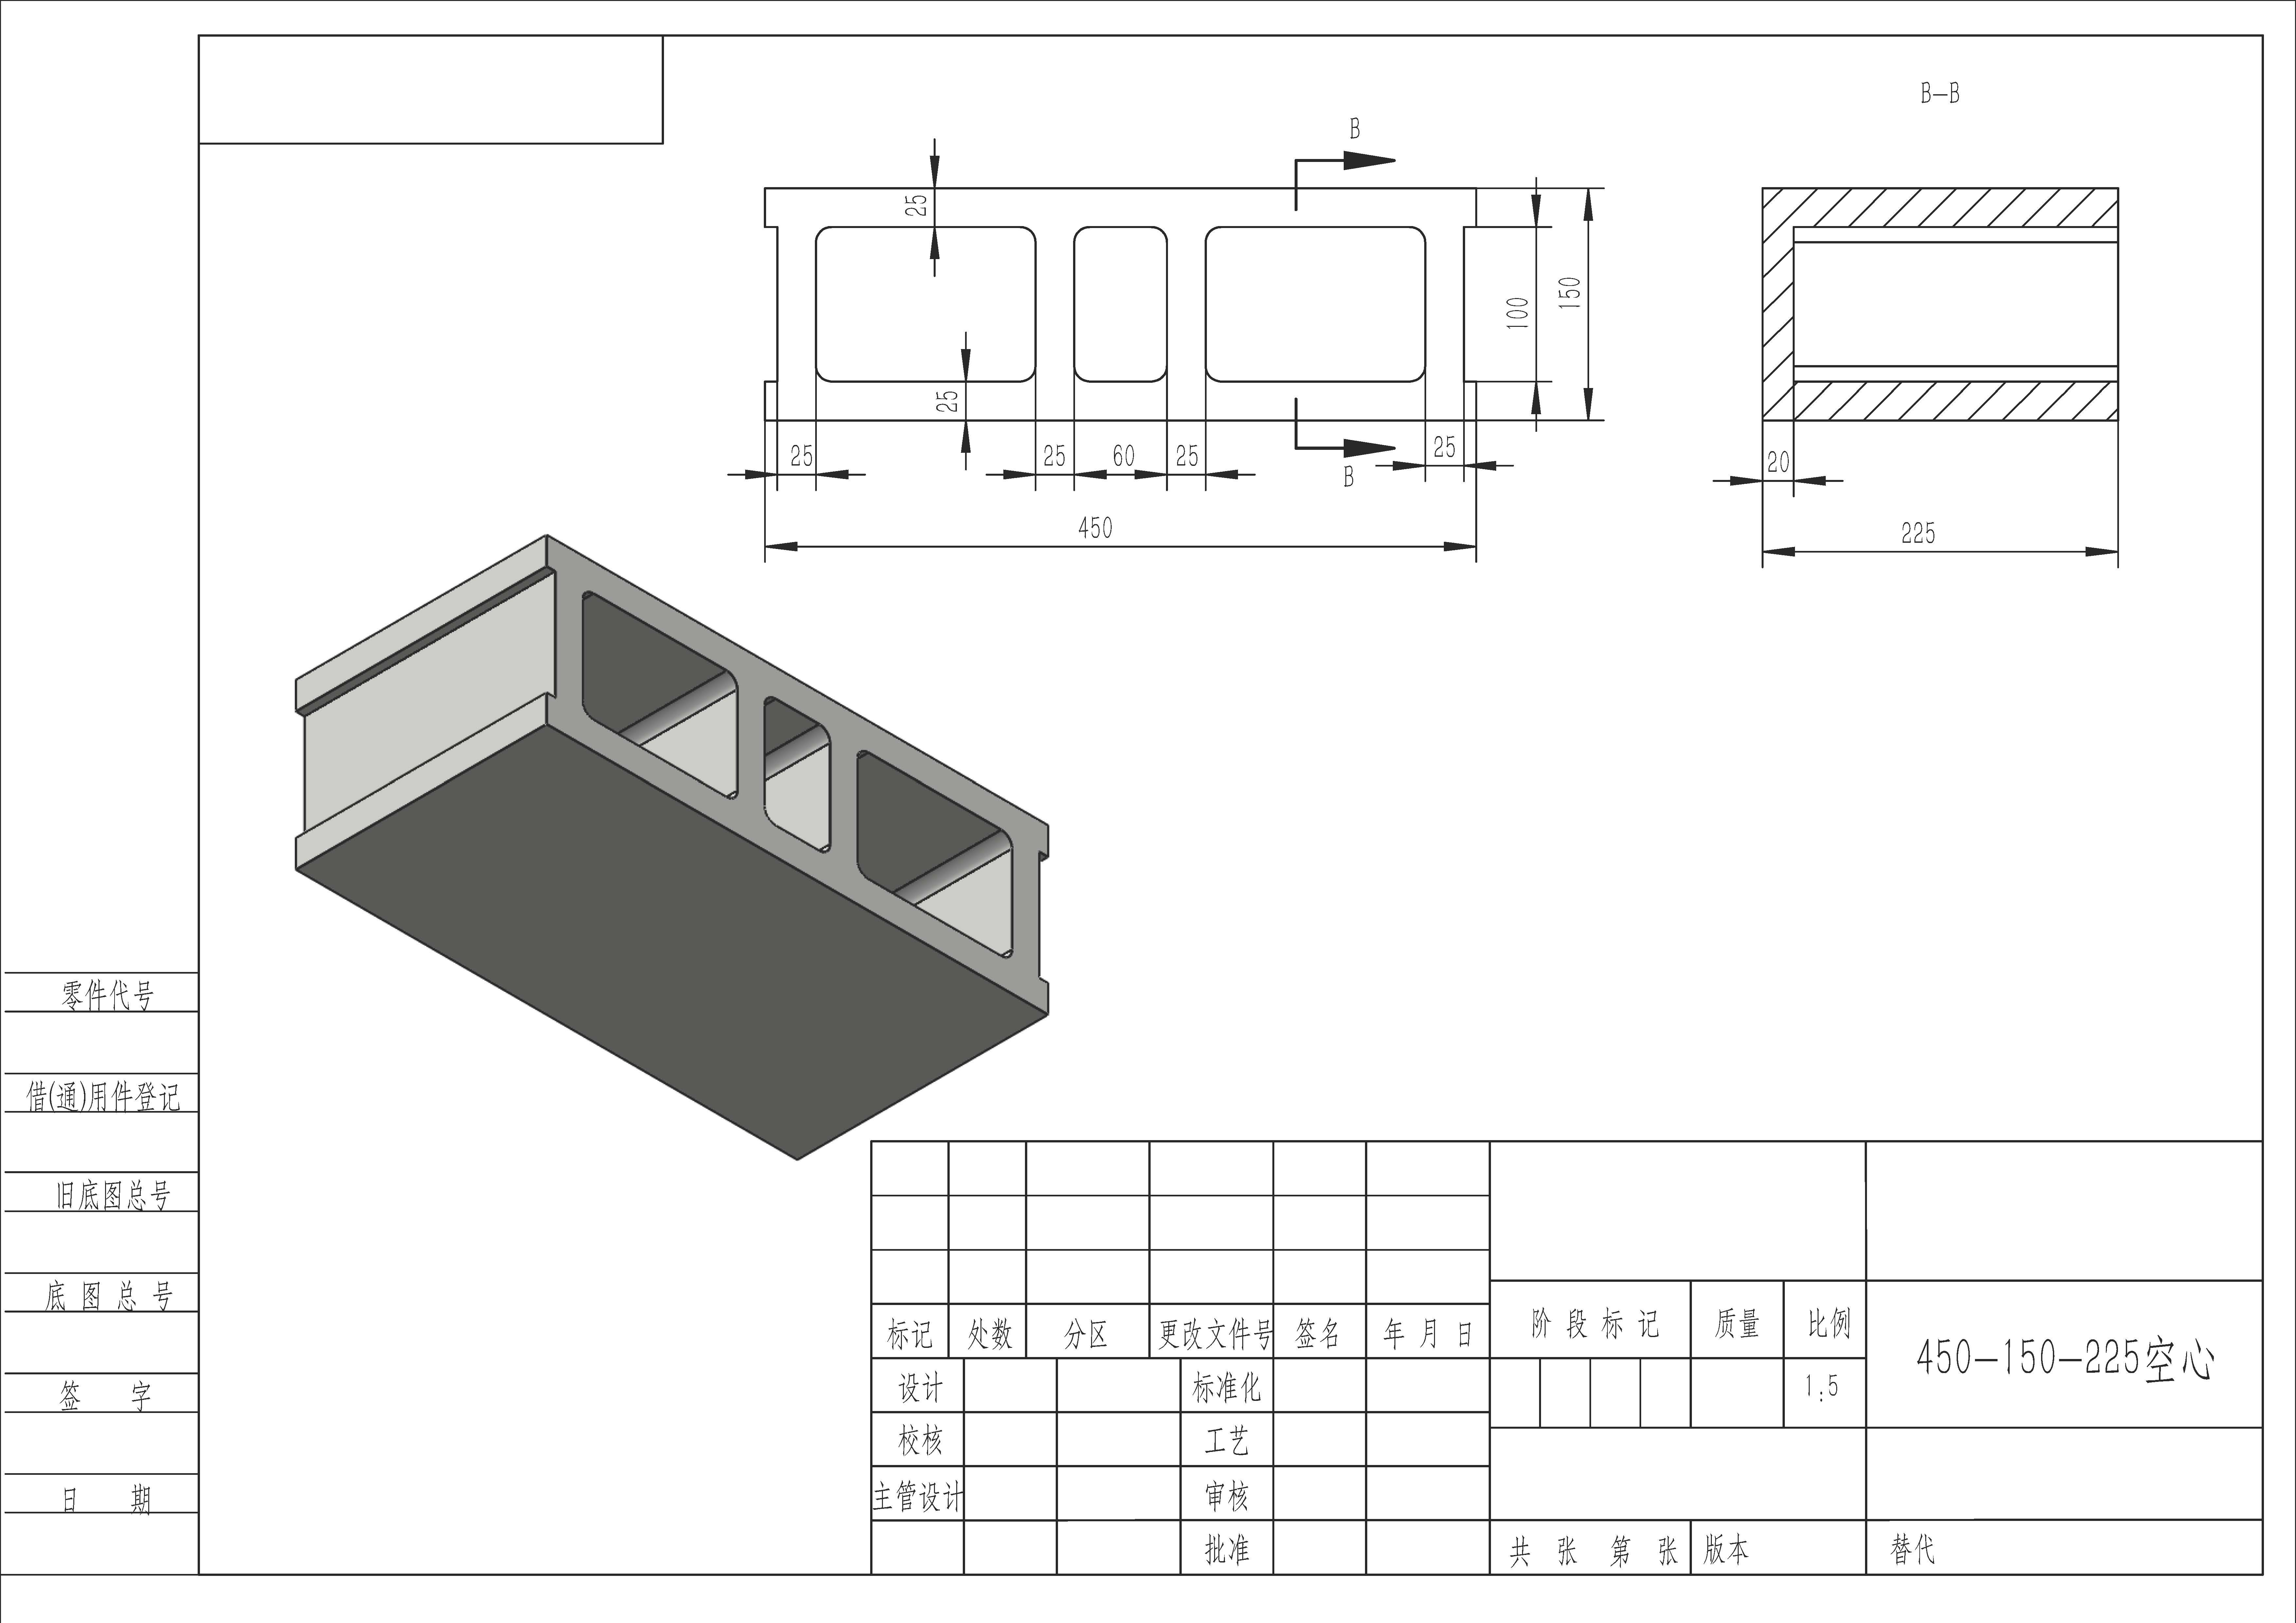 Concrete Hollow Block Design Types Of 6inch Block Design Block Design Blocks